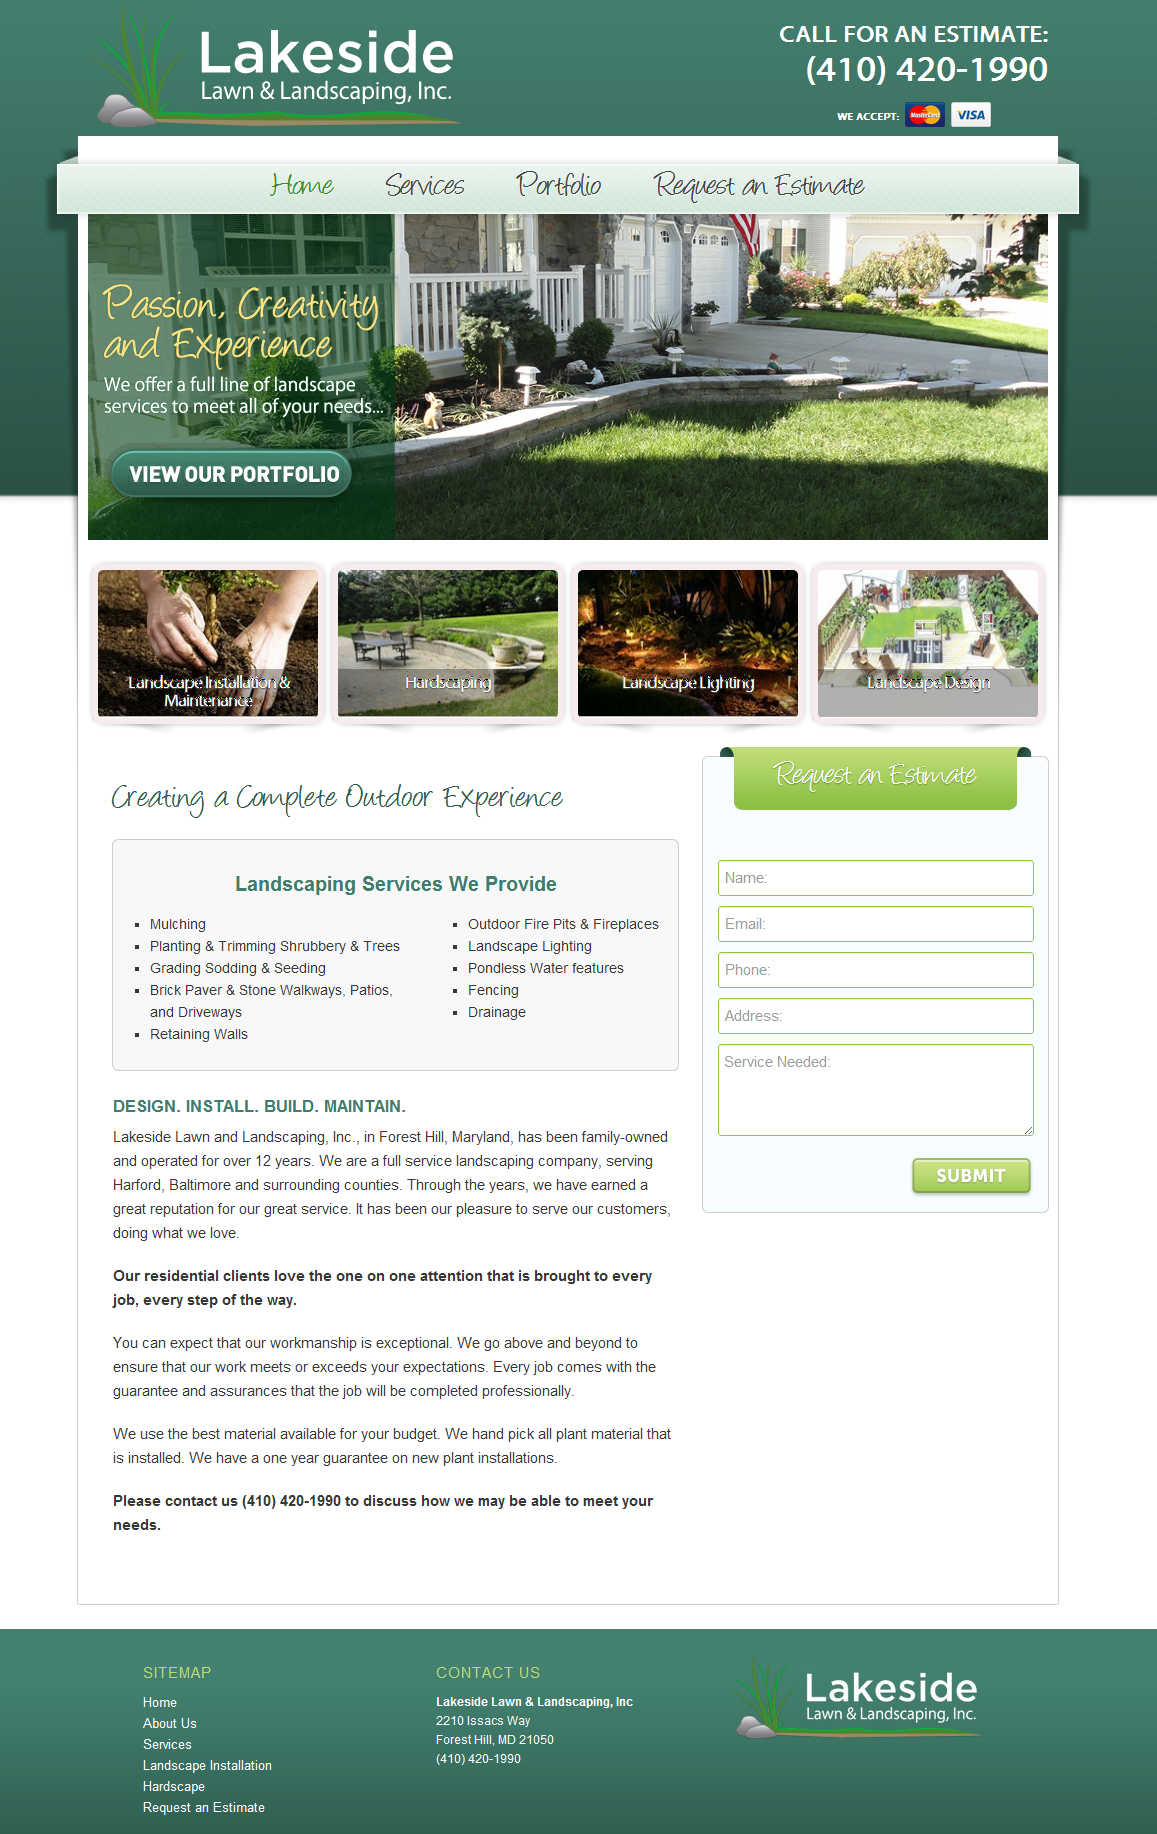 Lakeside Lawn and Landscaping, Inc. #webdesign #portfolio #landscaping